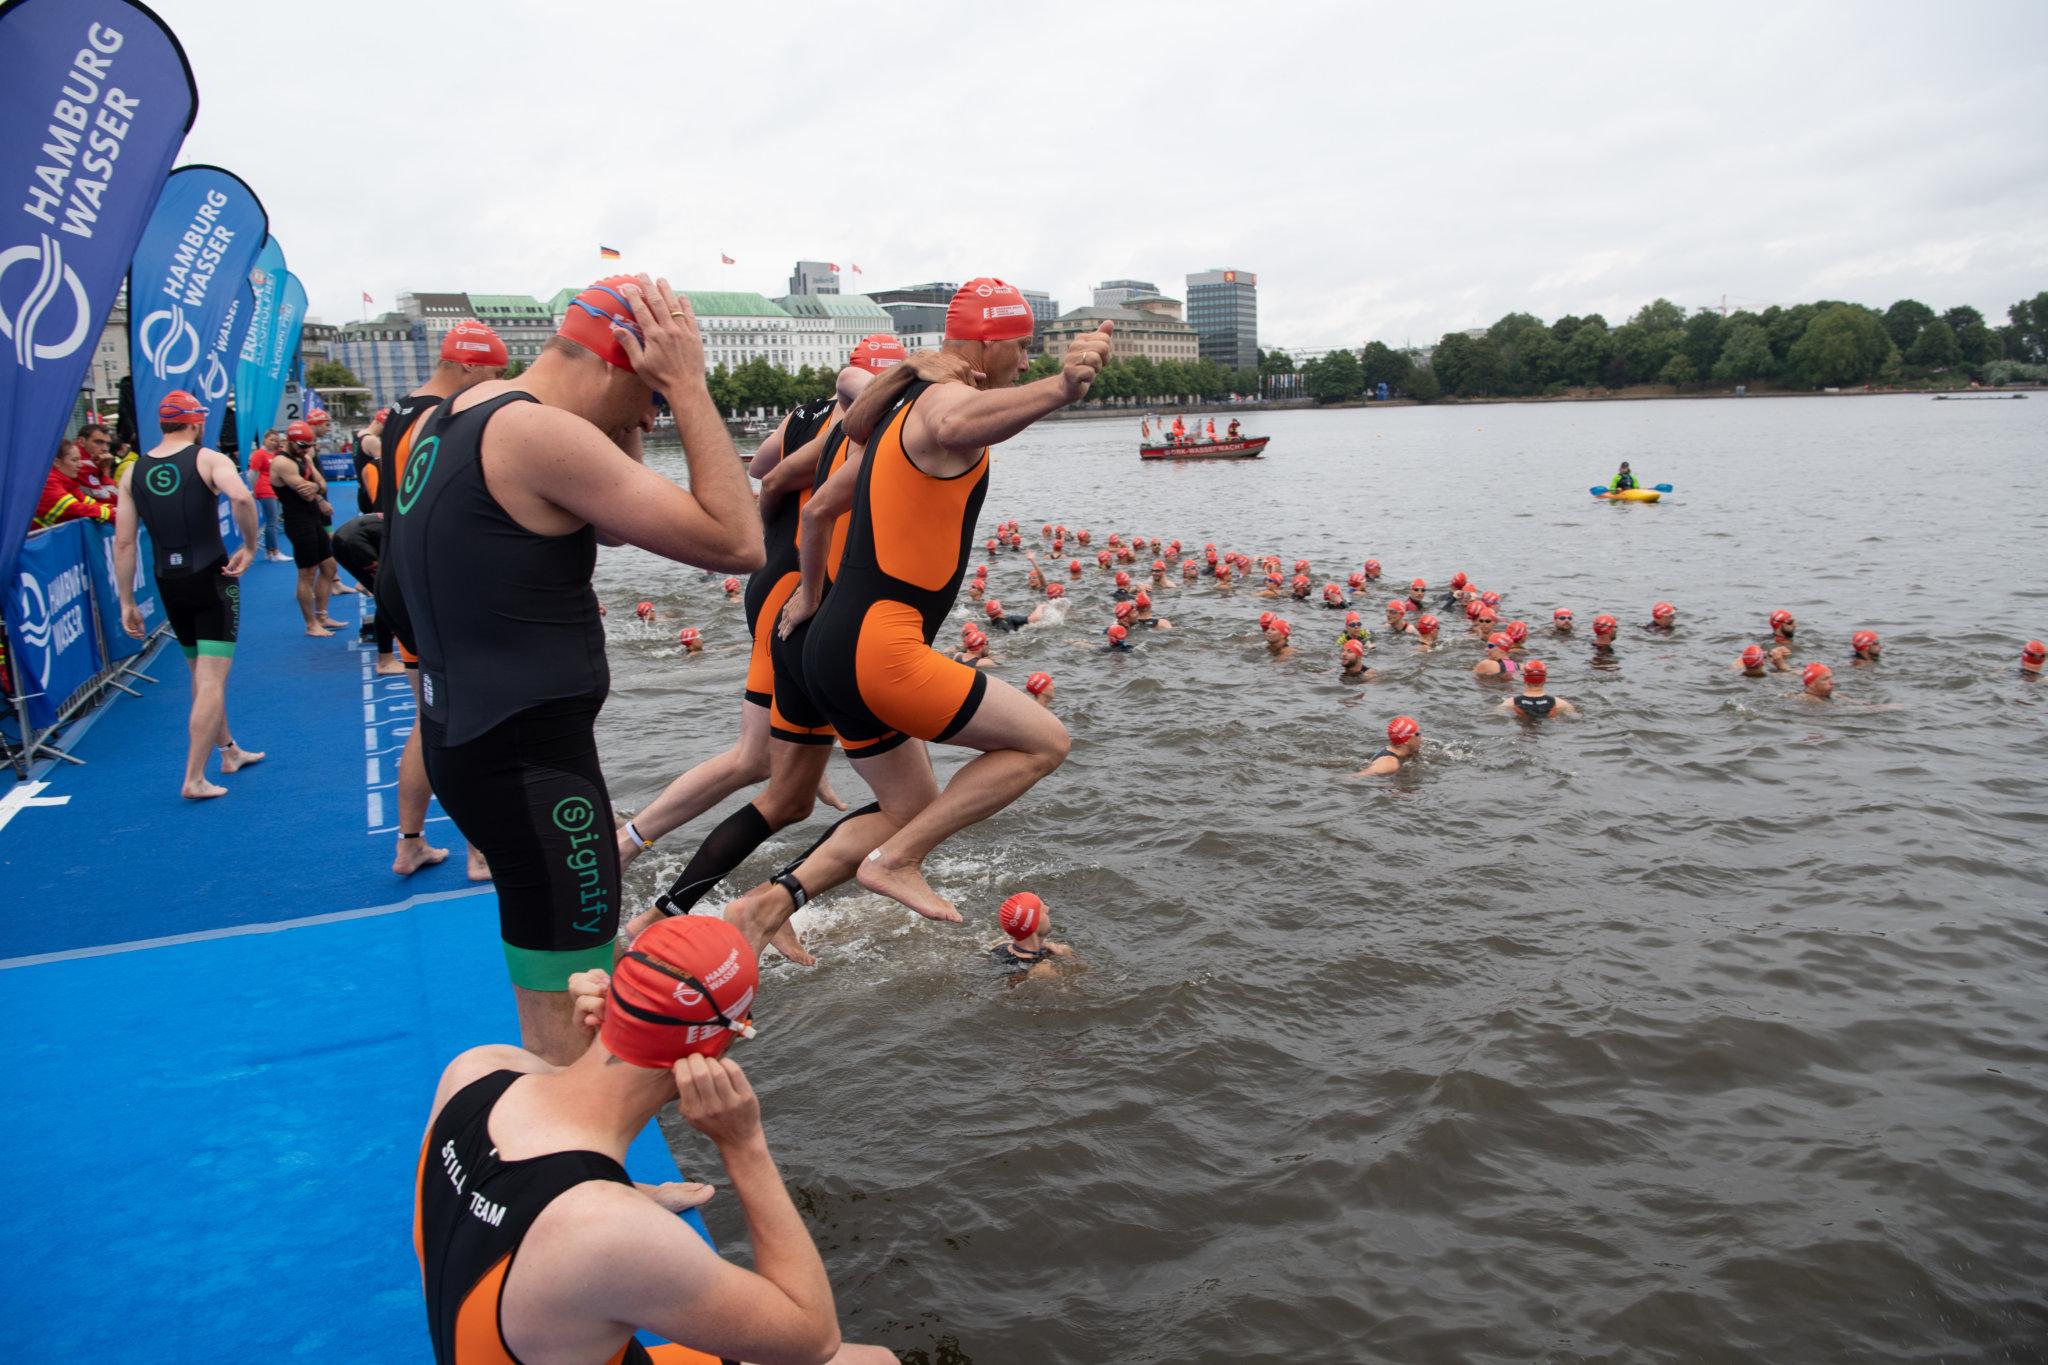 Bilder ITU Triathlon Hamburg - Sprint - 06 07 2019 - Helmuts